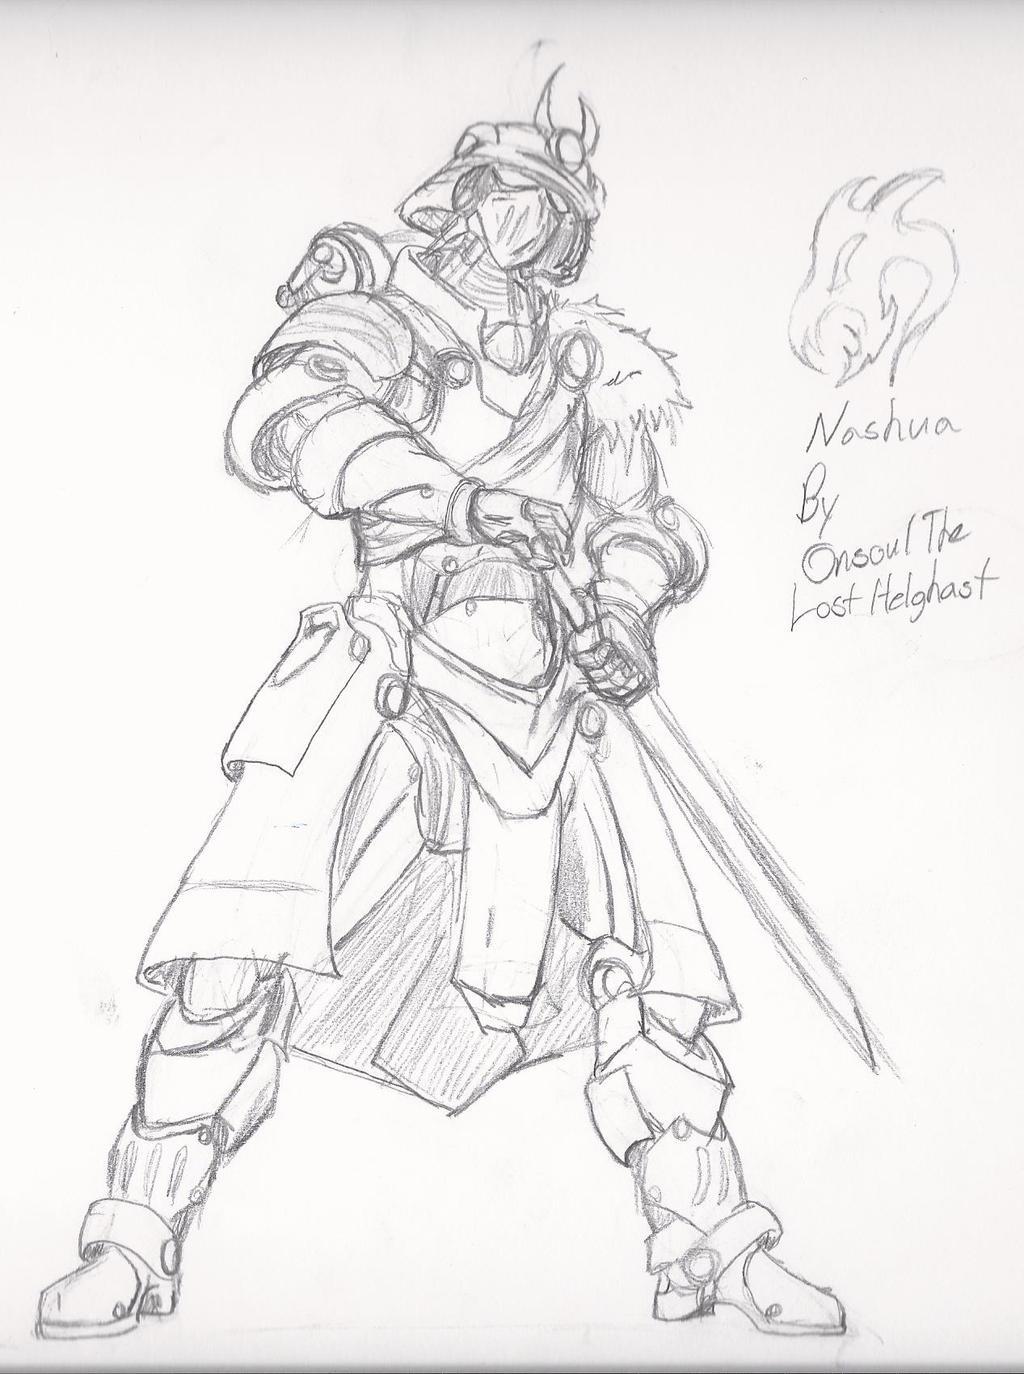 nashua steampunk samurai by onsoulthelosthelgast on deviantart